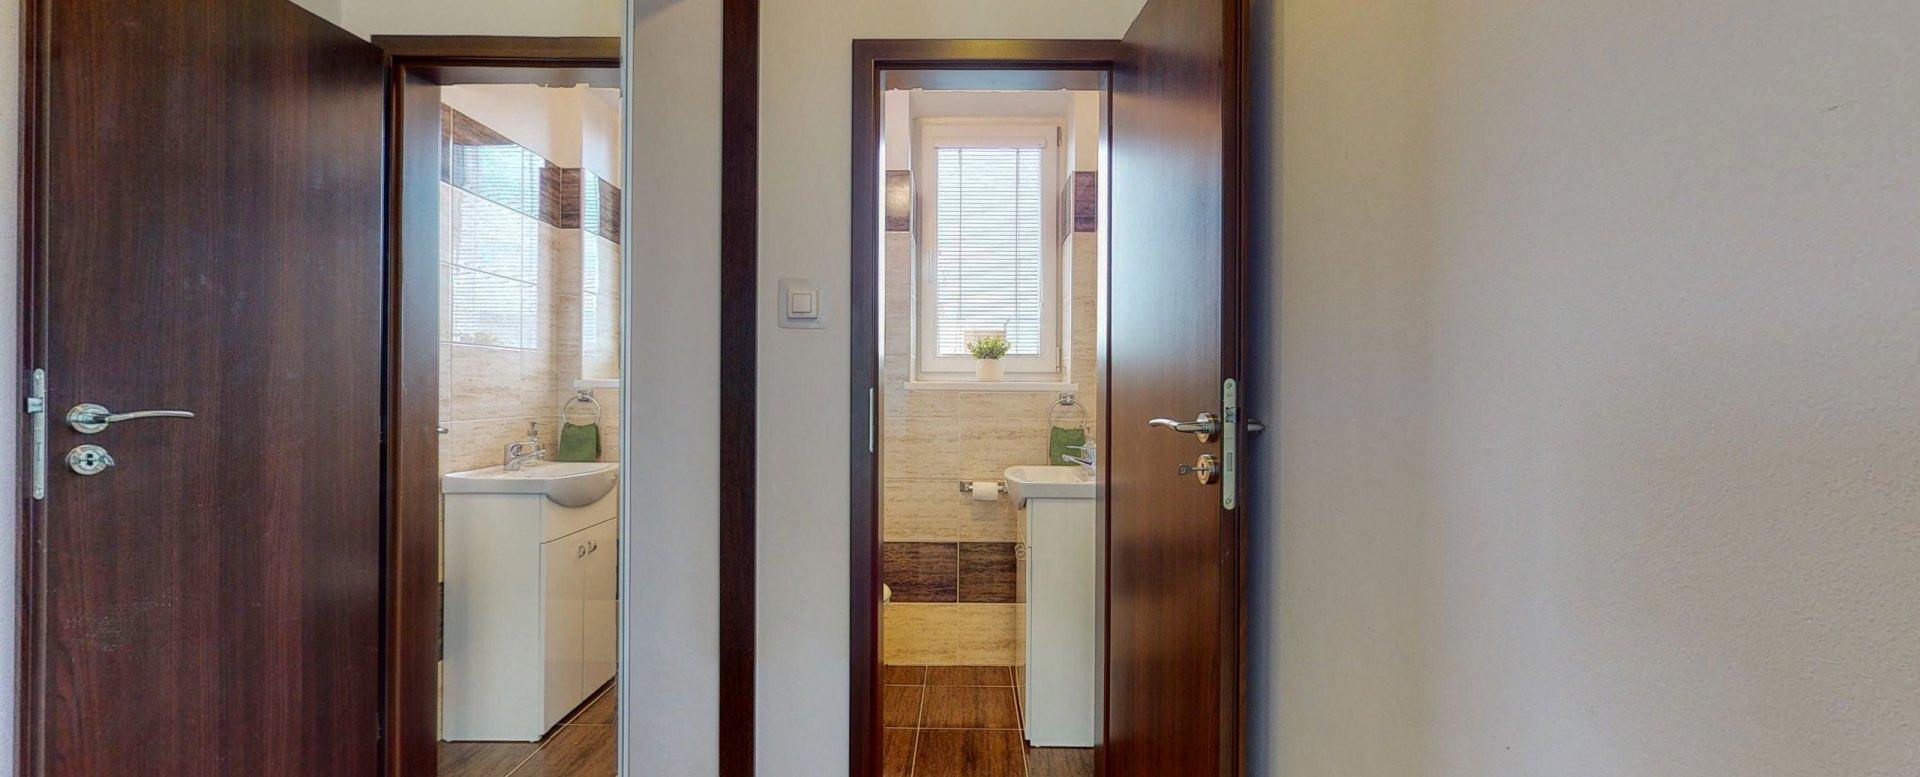 Pohľad na umývadlo s toaletou druhého podlažia